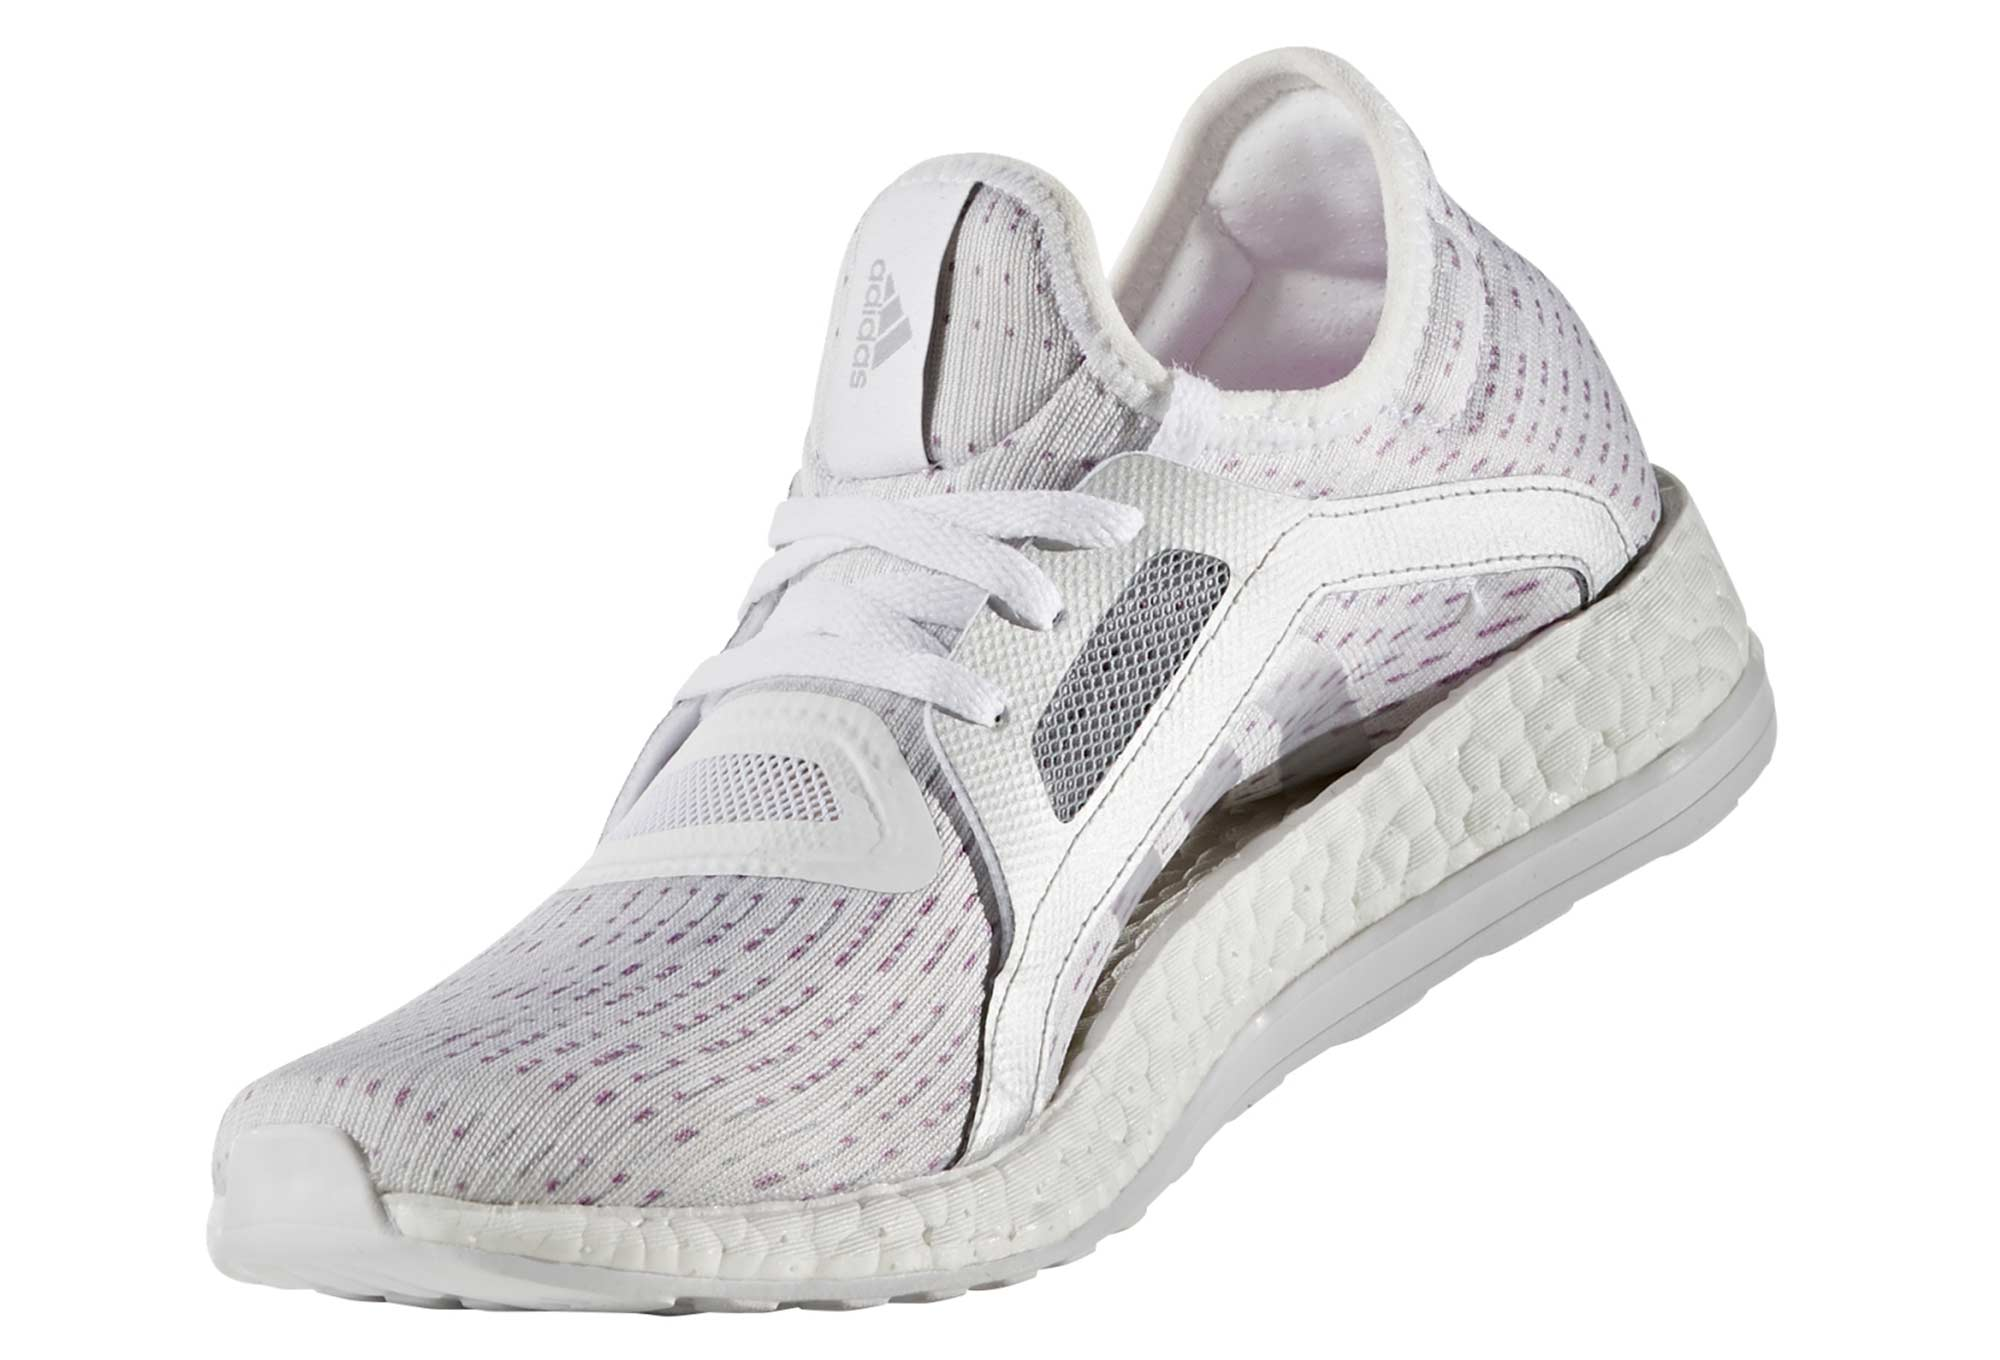 adidas running PURE BOOST X Blanc Violet Femme